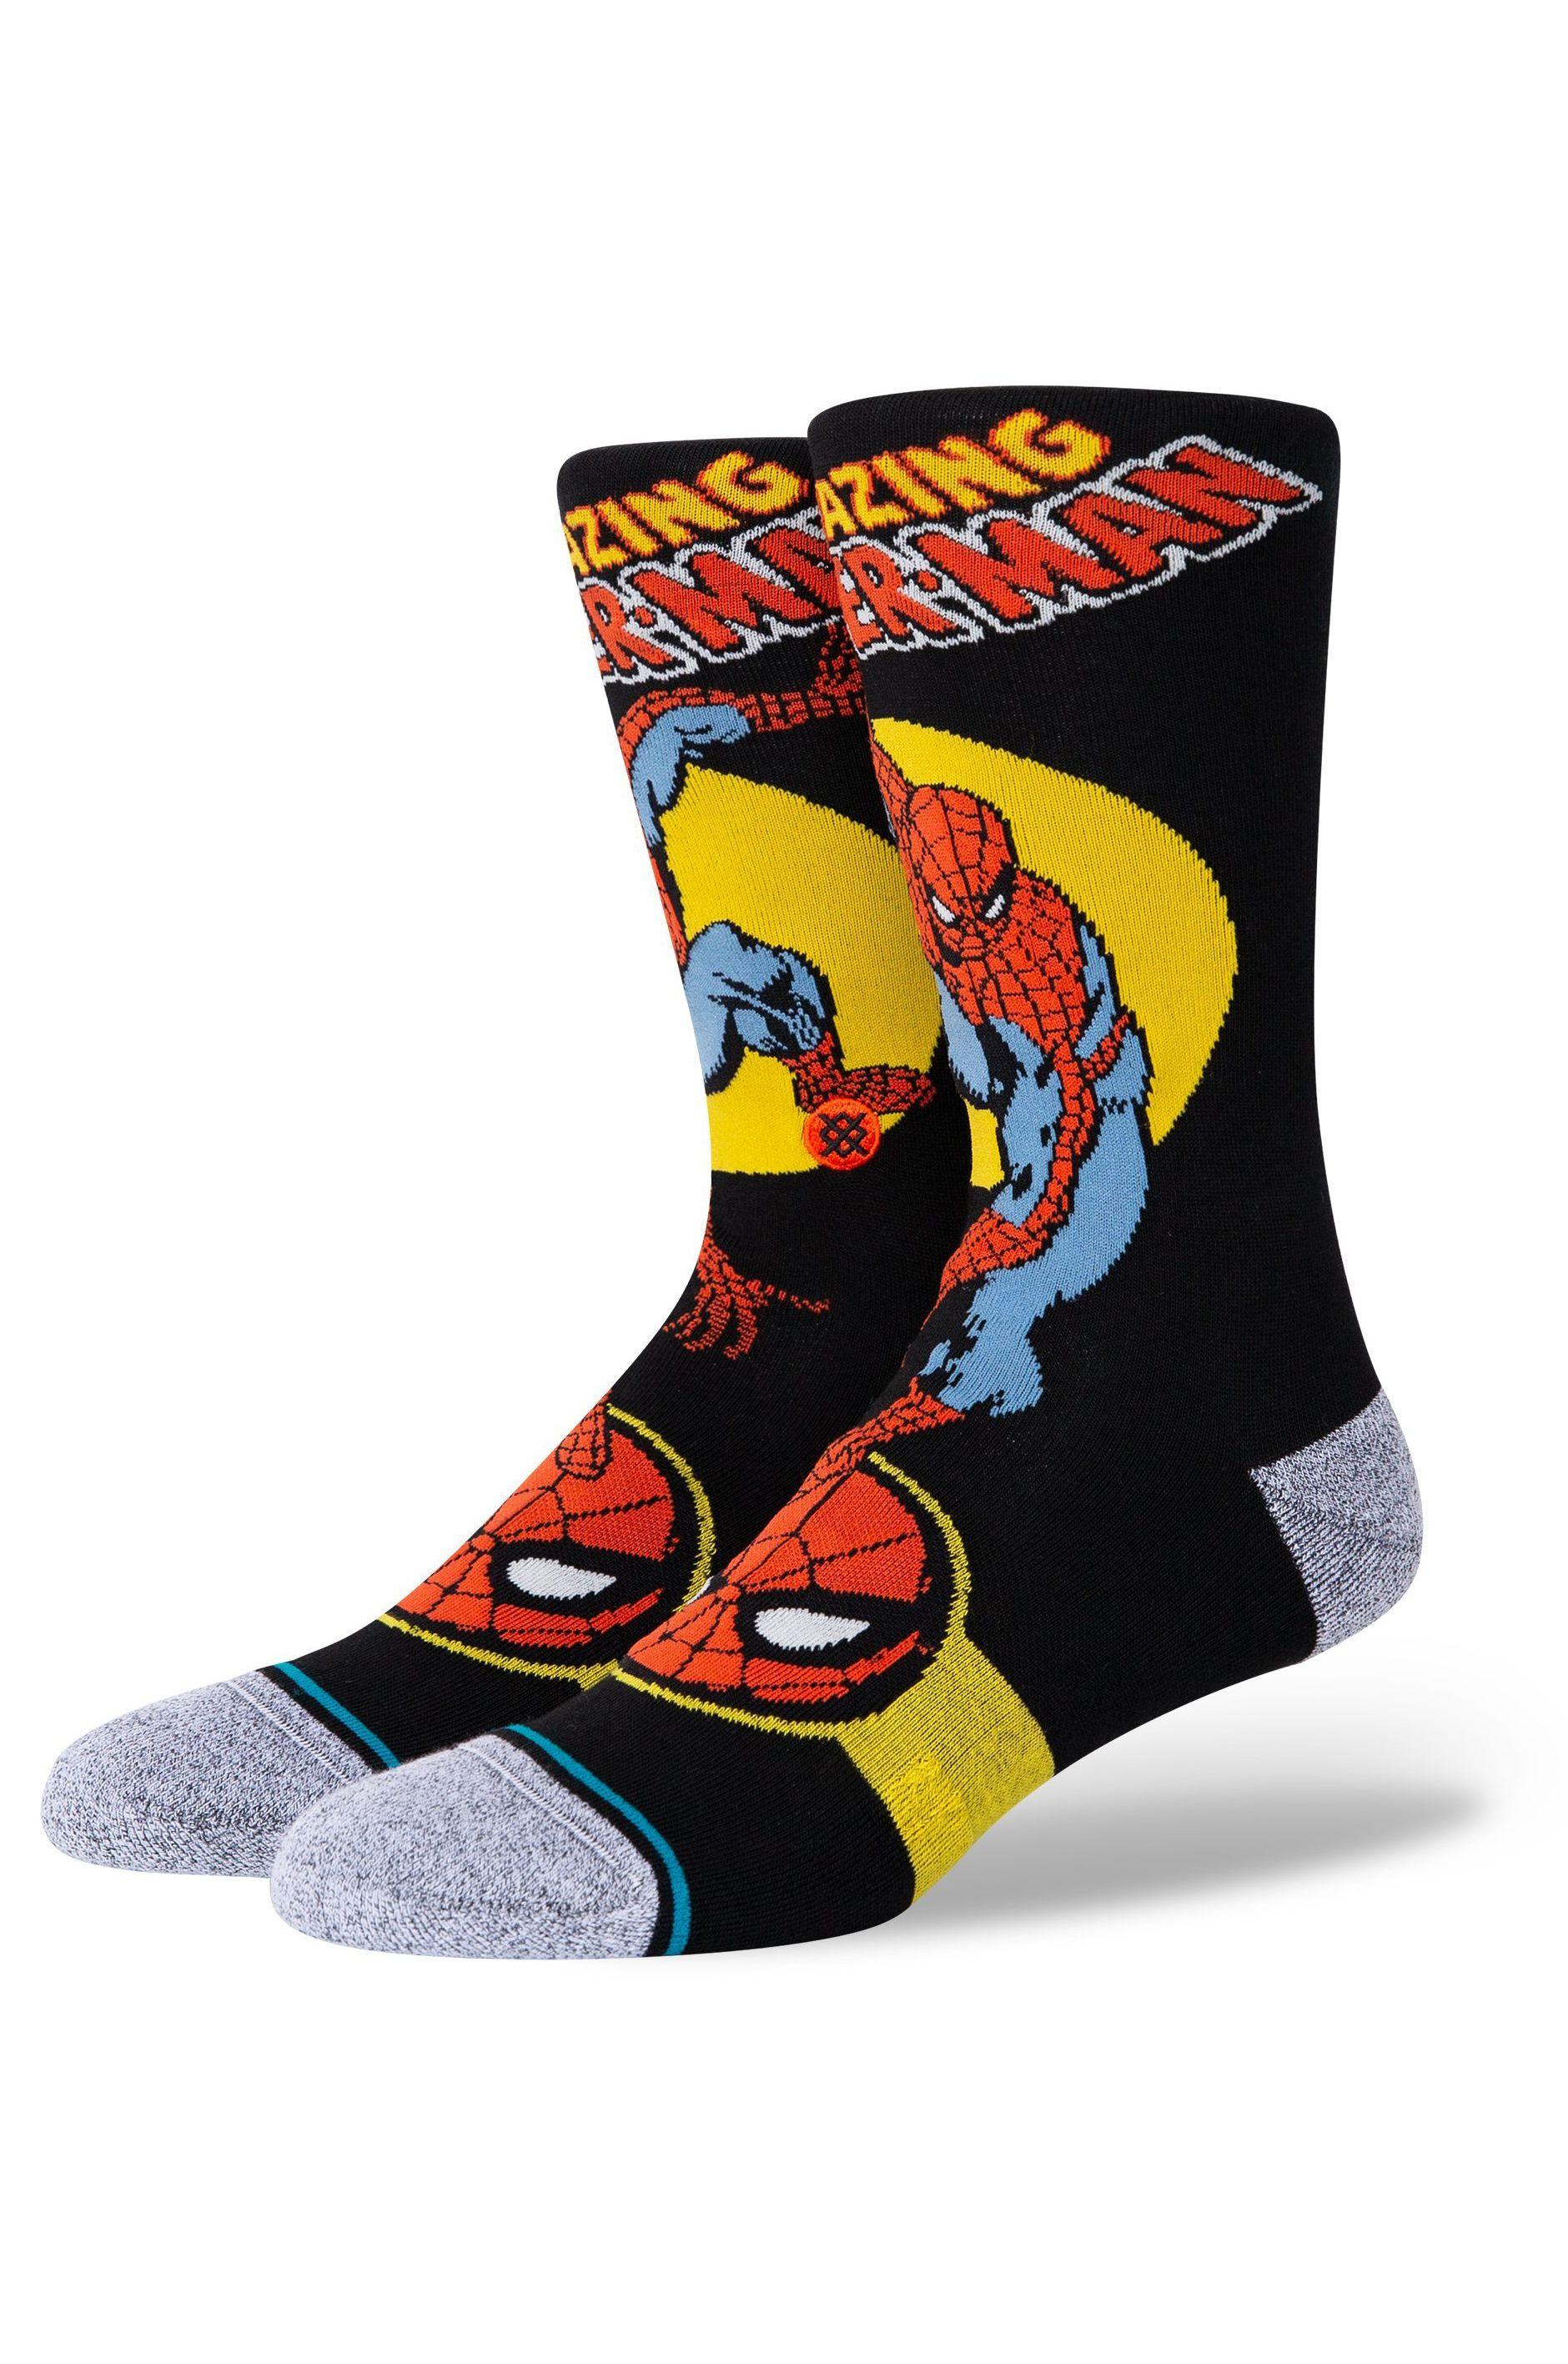 Stance Socks SPIDER MAN MARQUEE Black